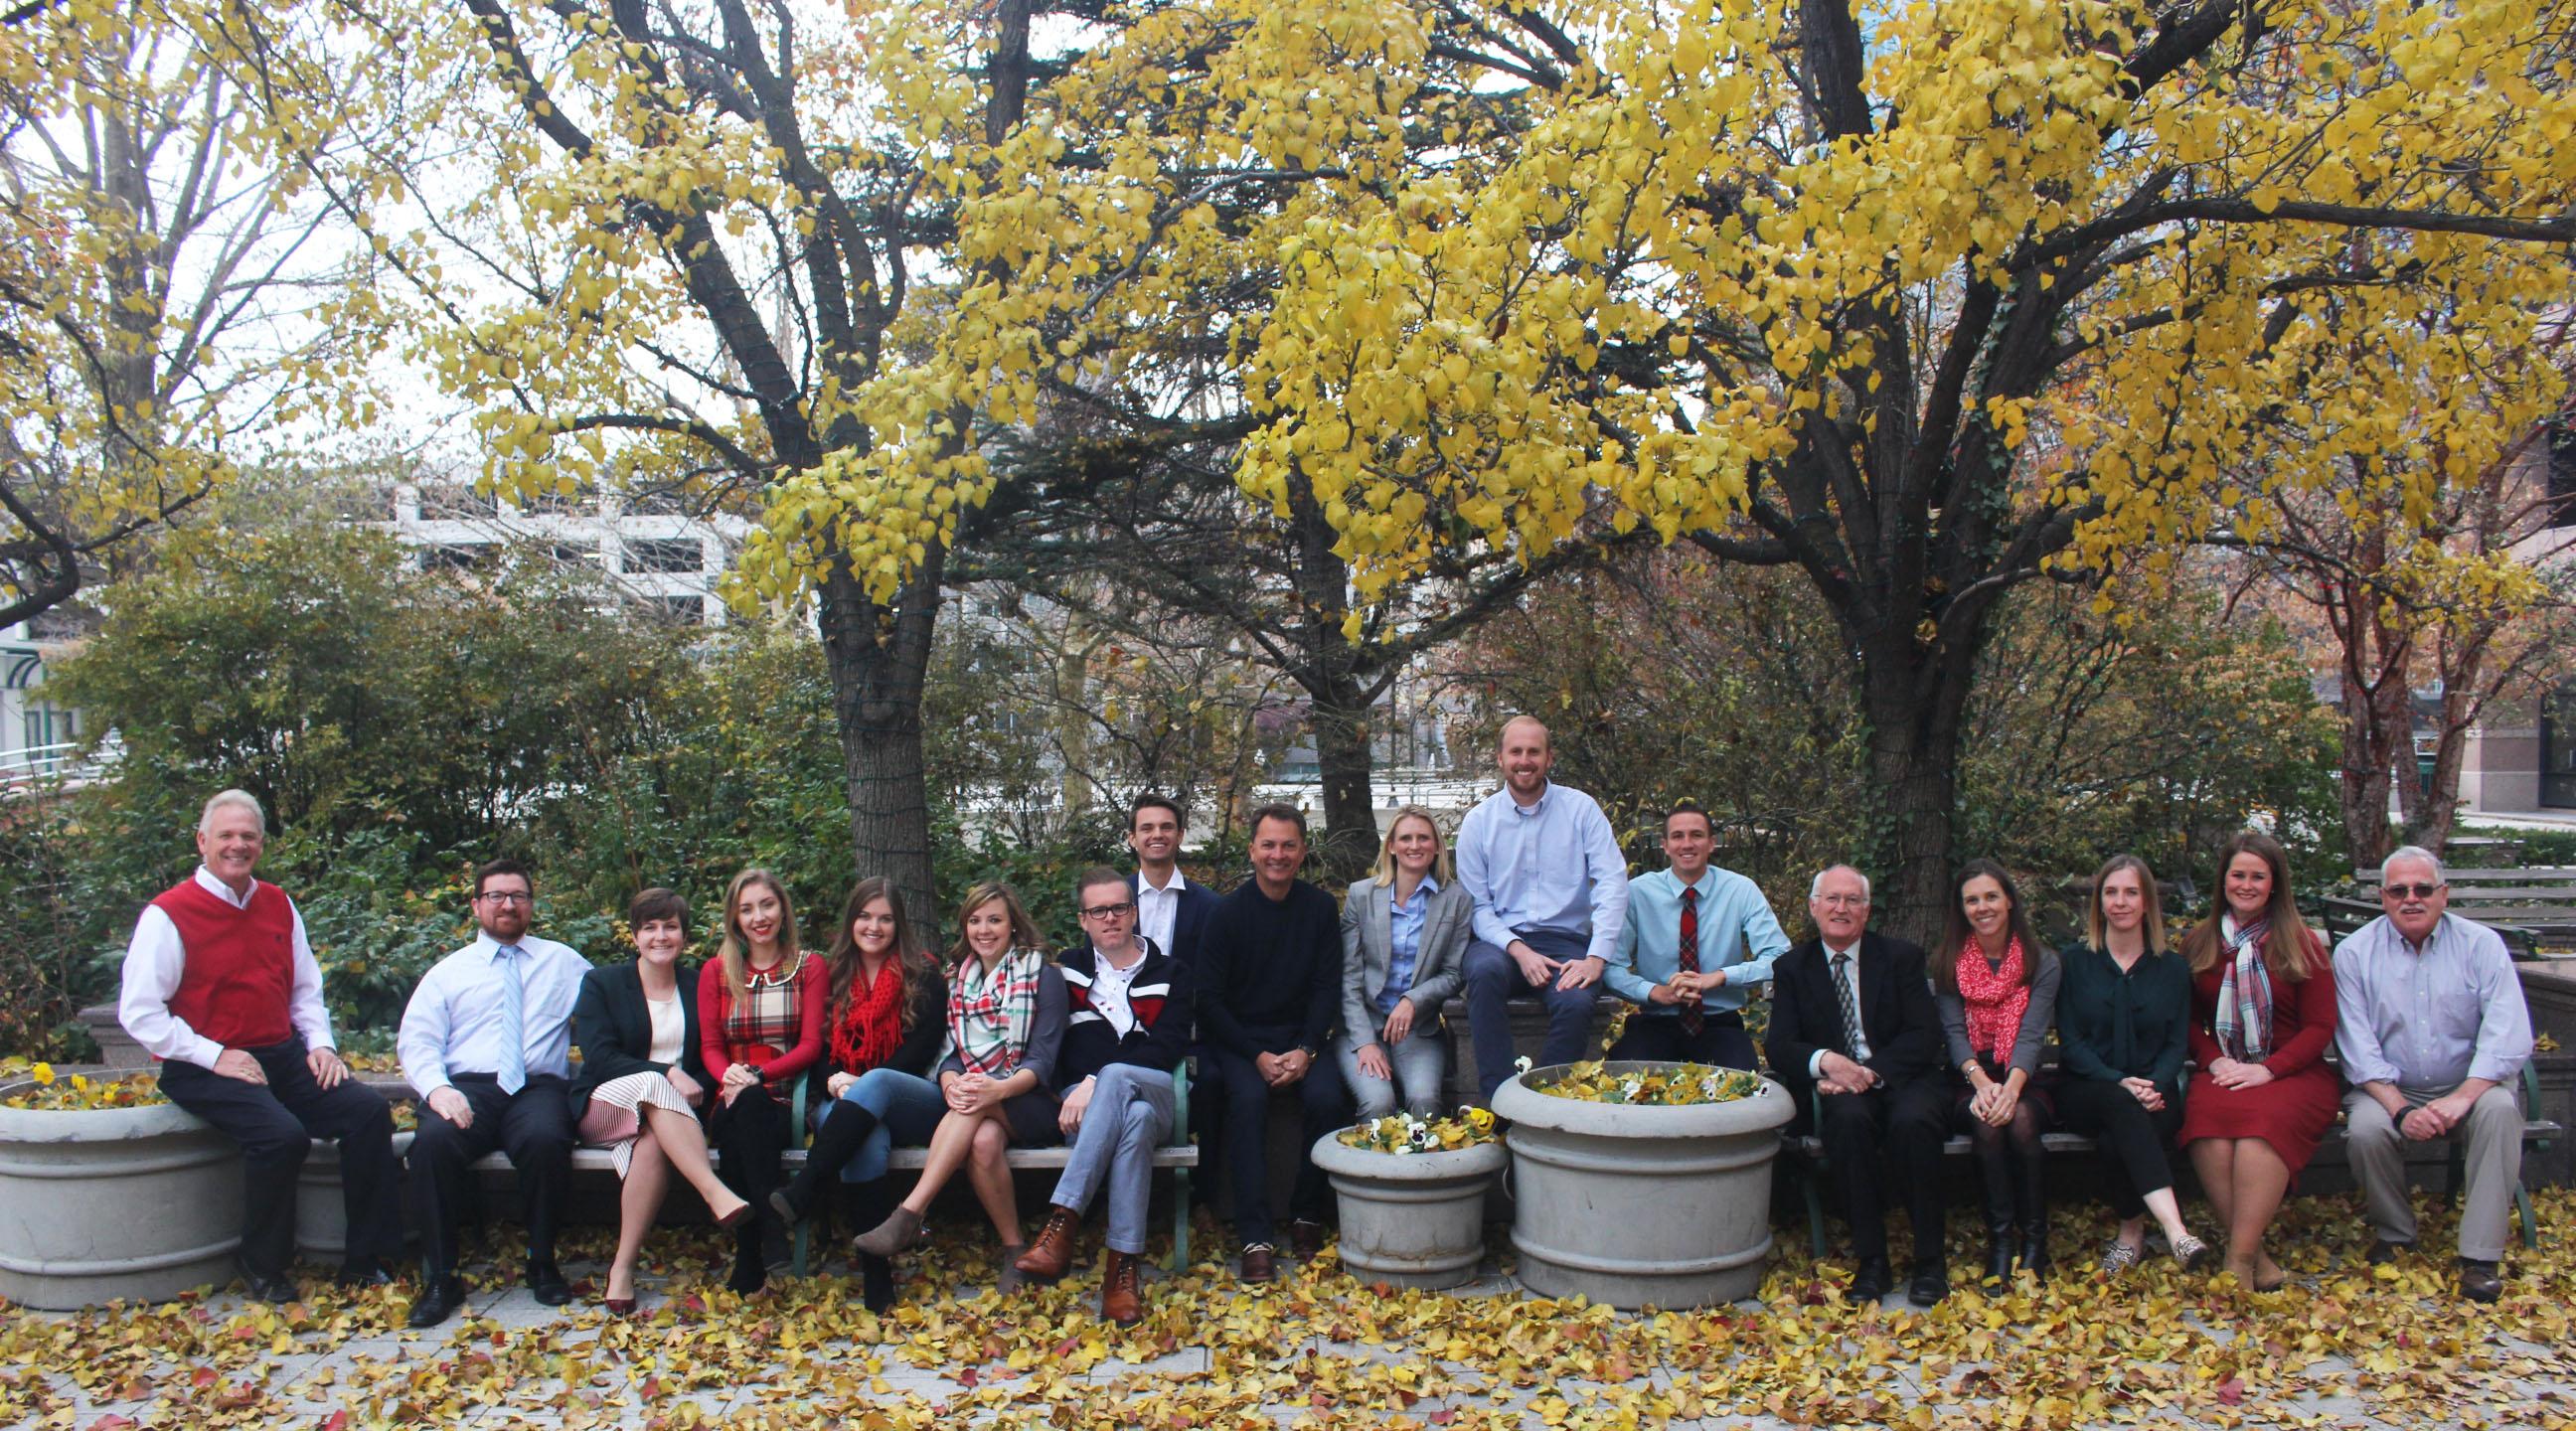 A photo of the EDCUtah staff outside their office in Salt Lake City, Utah.